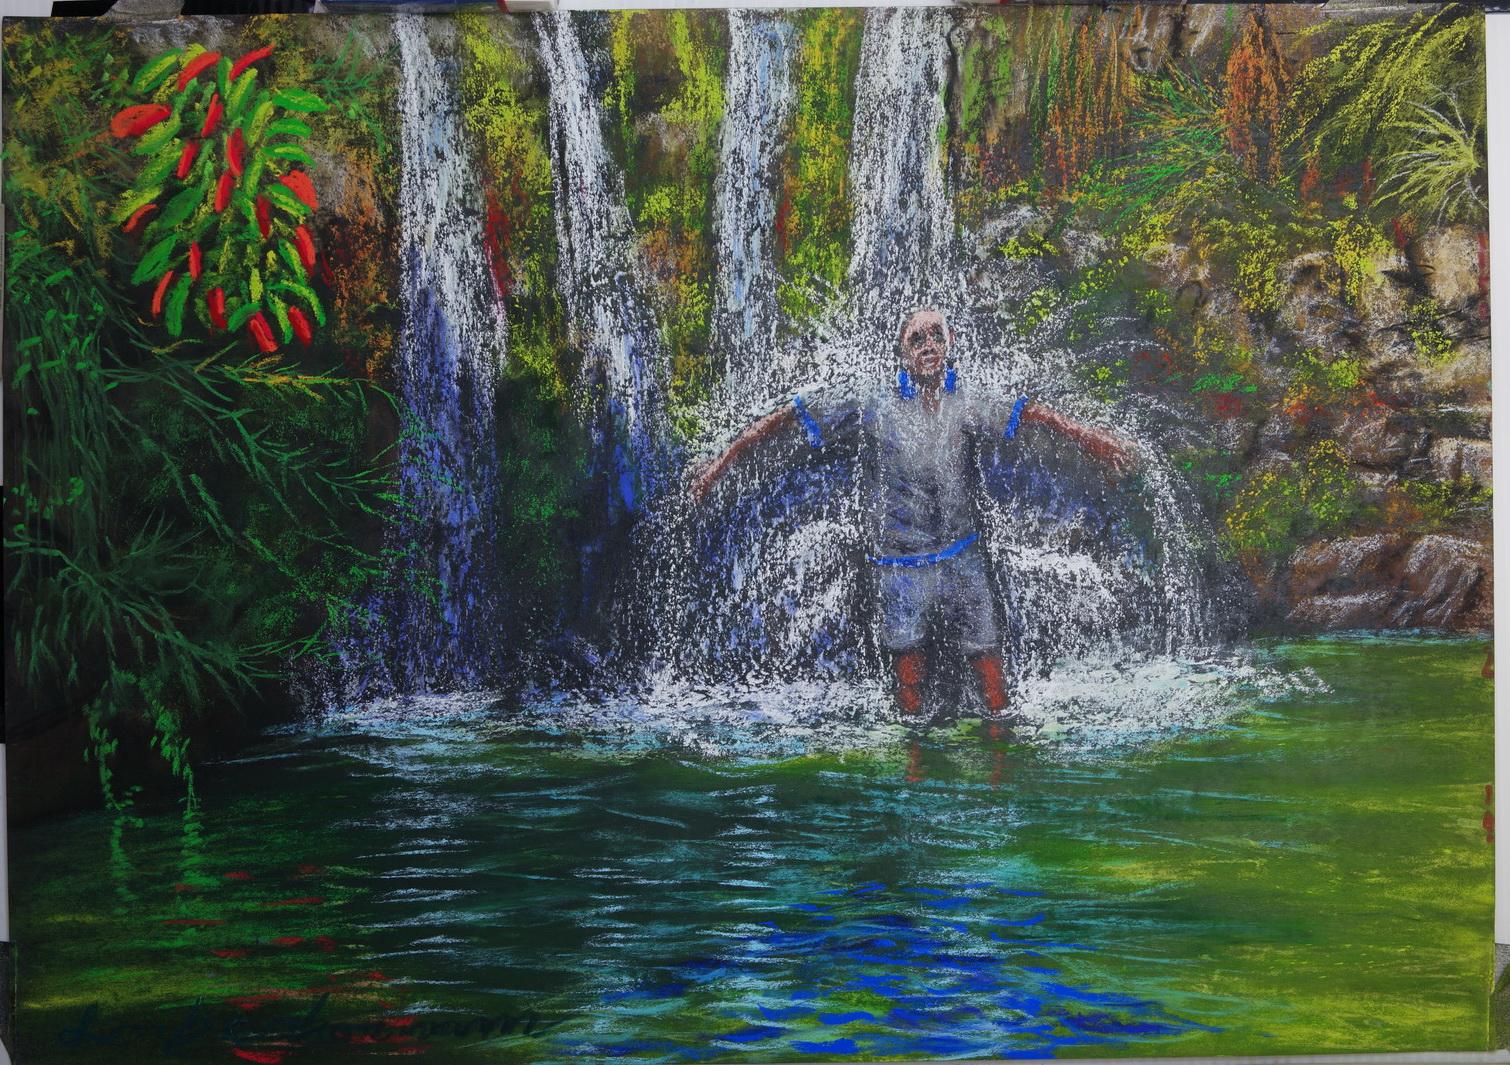 Figure showers under water fall at Nahal David Lorberboim Soft Pastel Painting. דמות אפופה במפל בנחל דוד